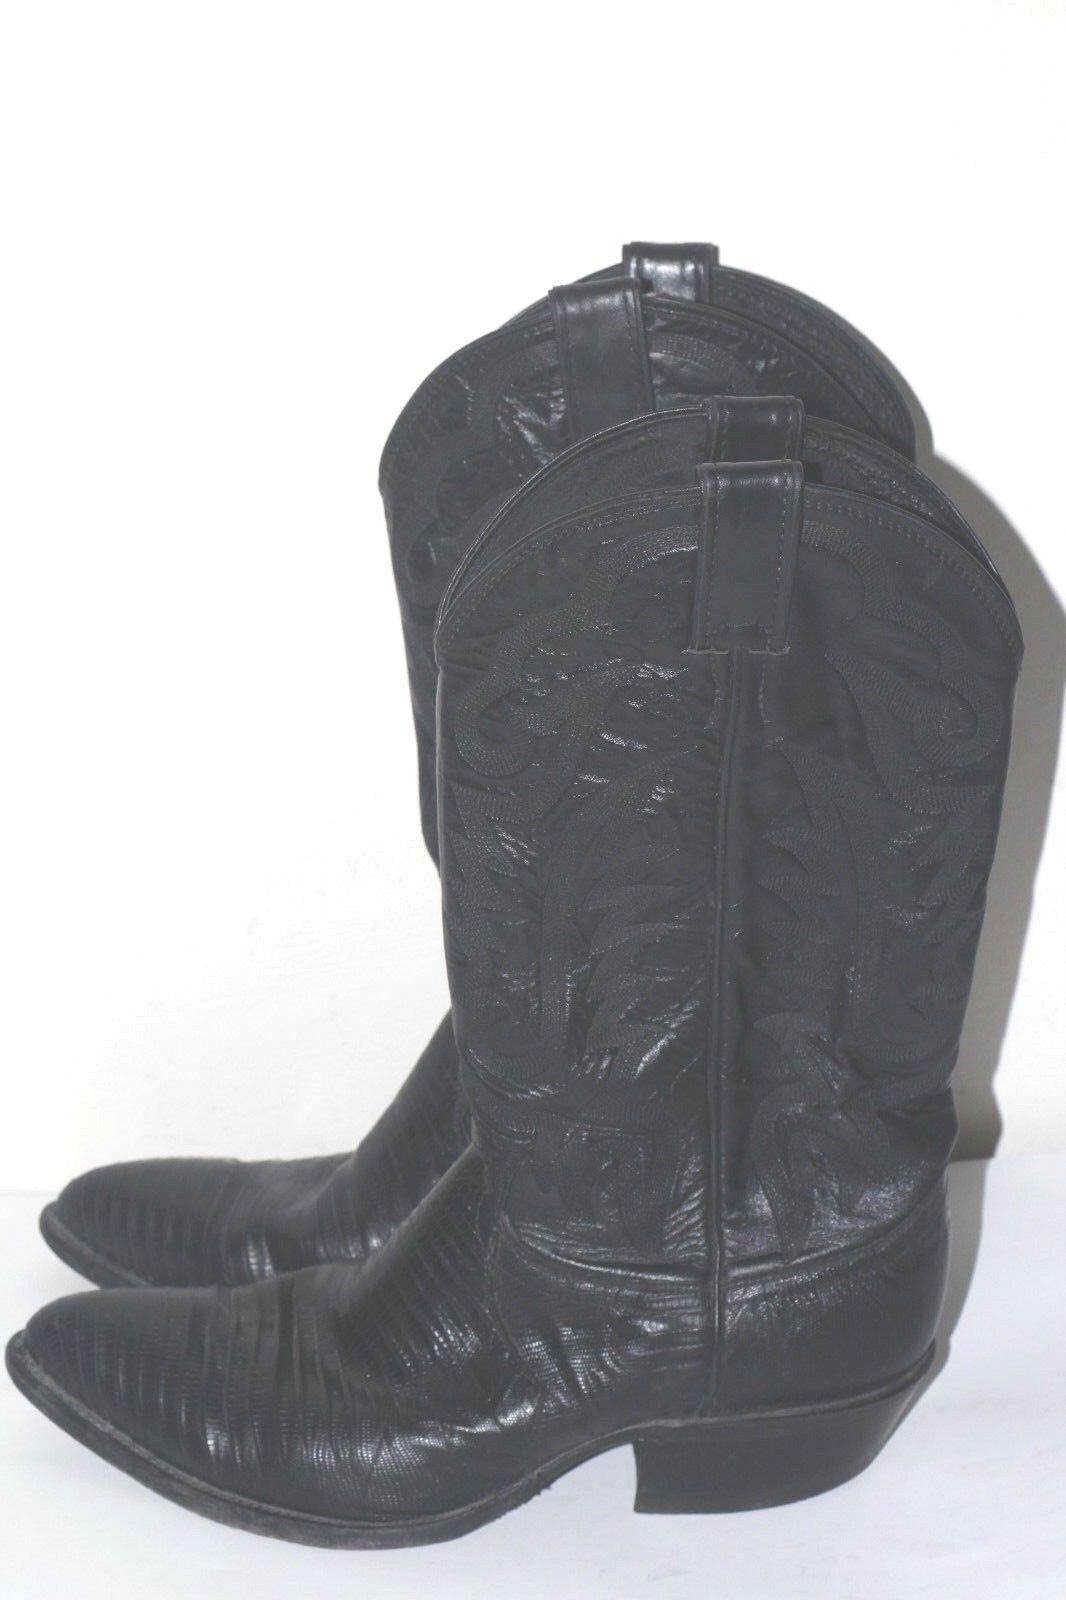 Men's Vtg justin 8105 Iguana CowBoy Boots Black Leather sz 8.5 EE  Made in Usa